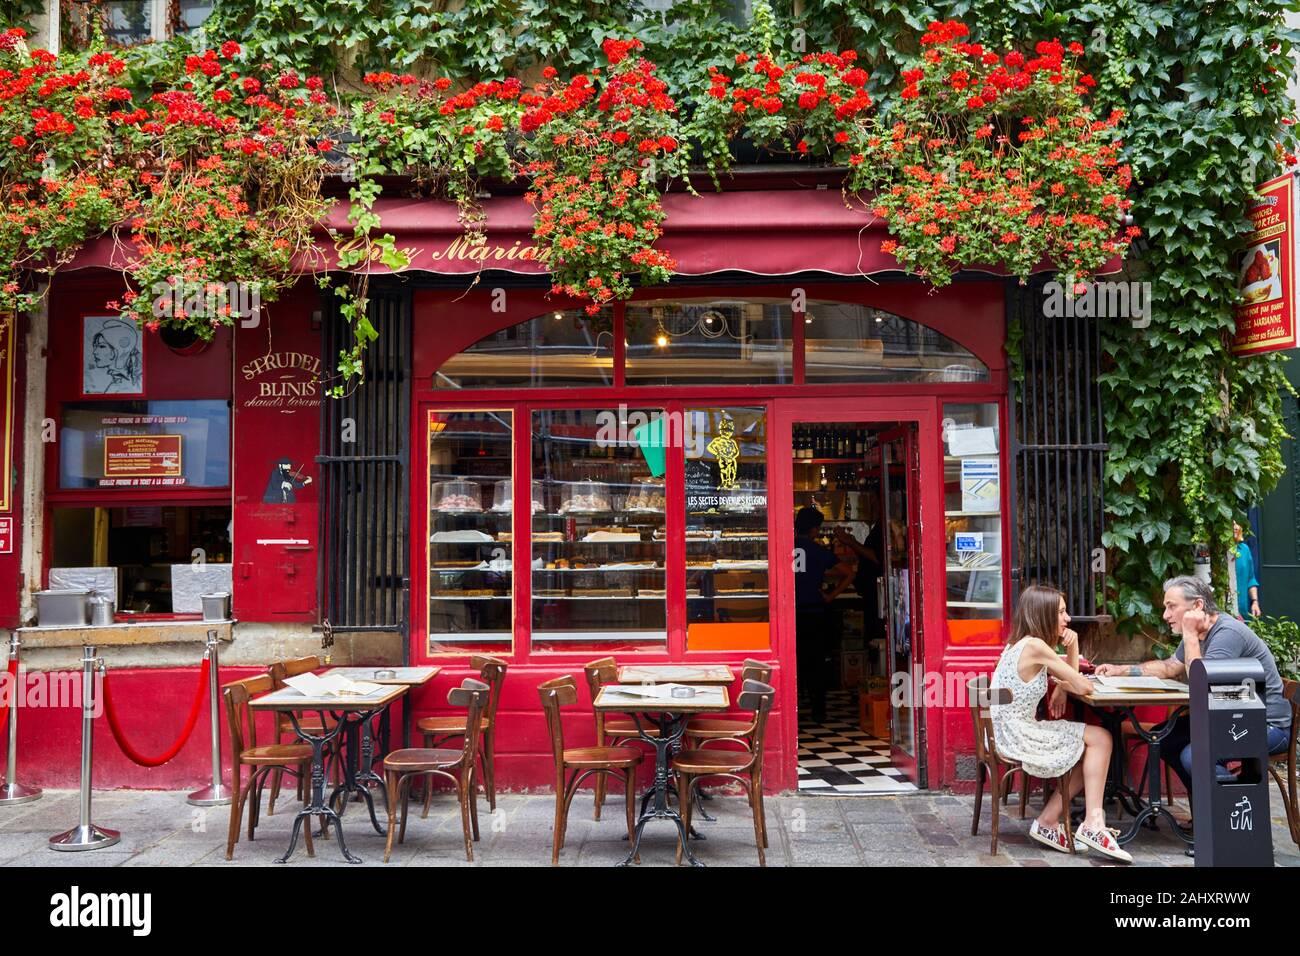 Terrasse, Le Marais, Paris, Frankreich Stockfoto